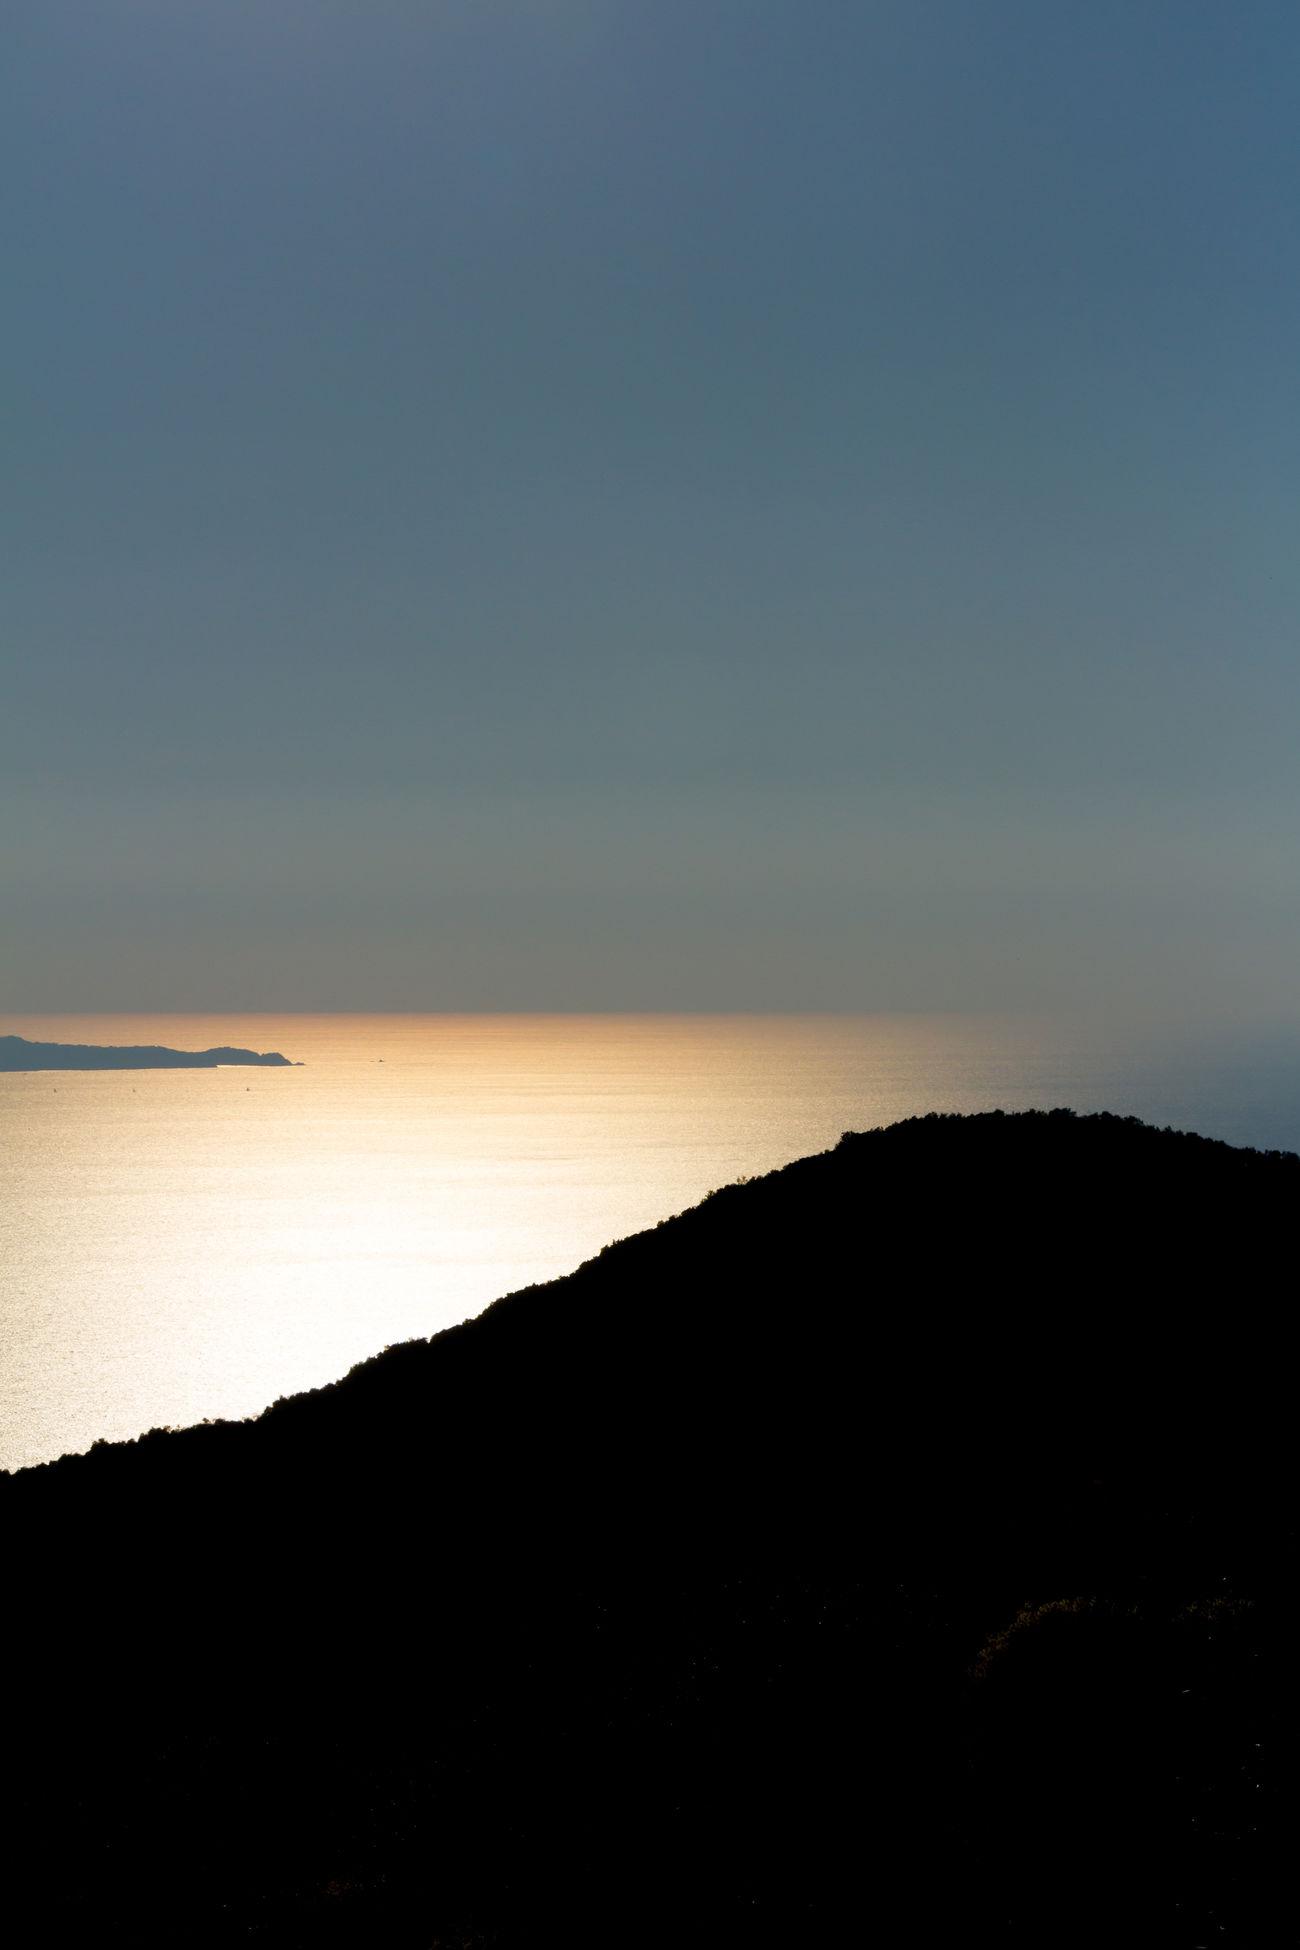 EyeEm Best Shots Greece Holiday Portrait Sea Seascape Silhouette Sunset